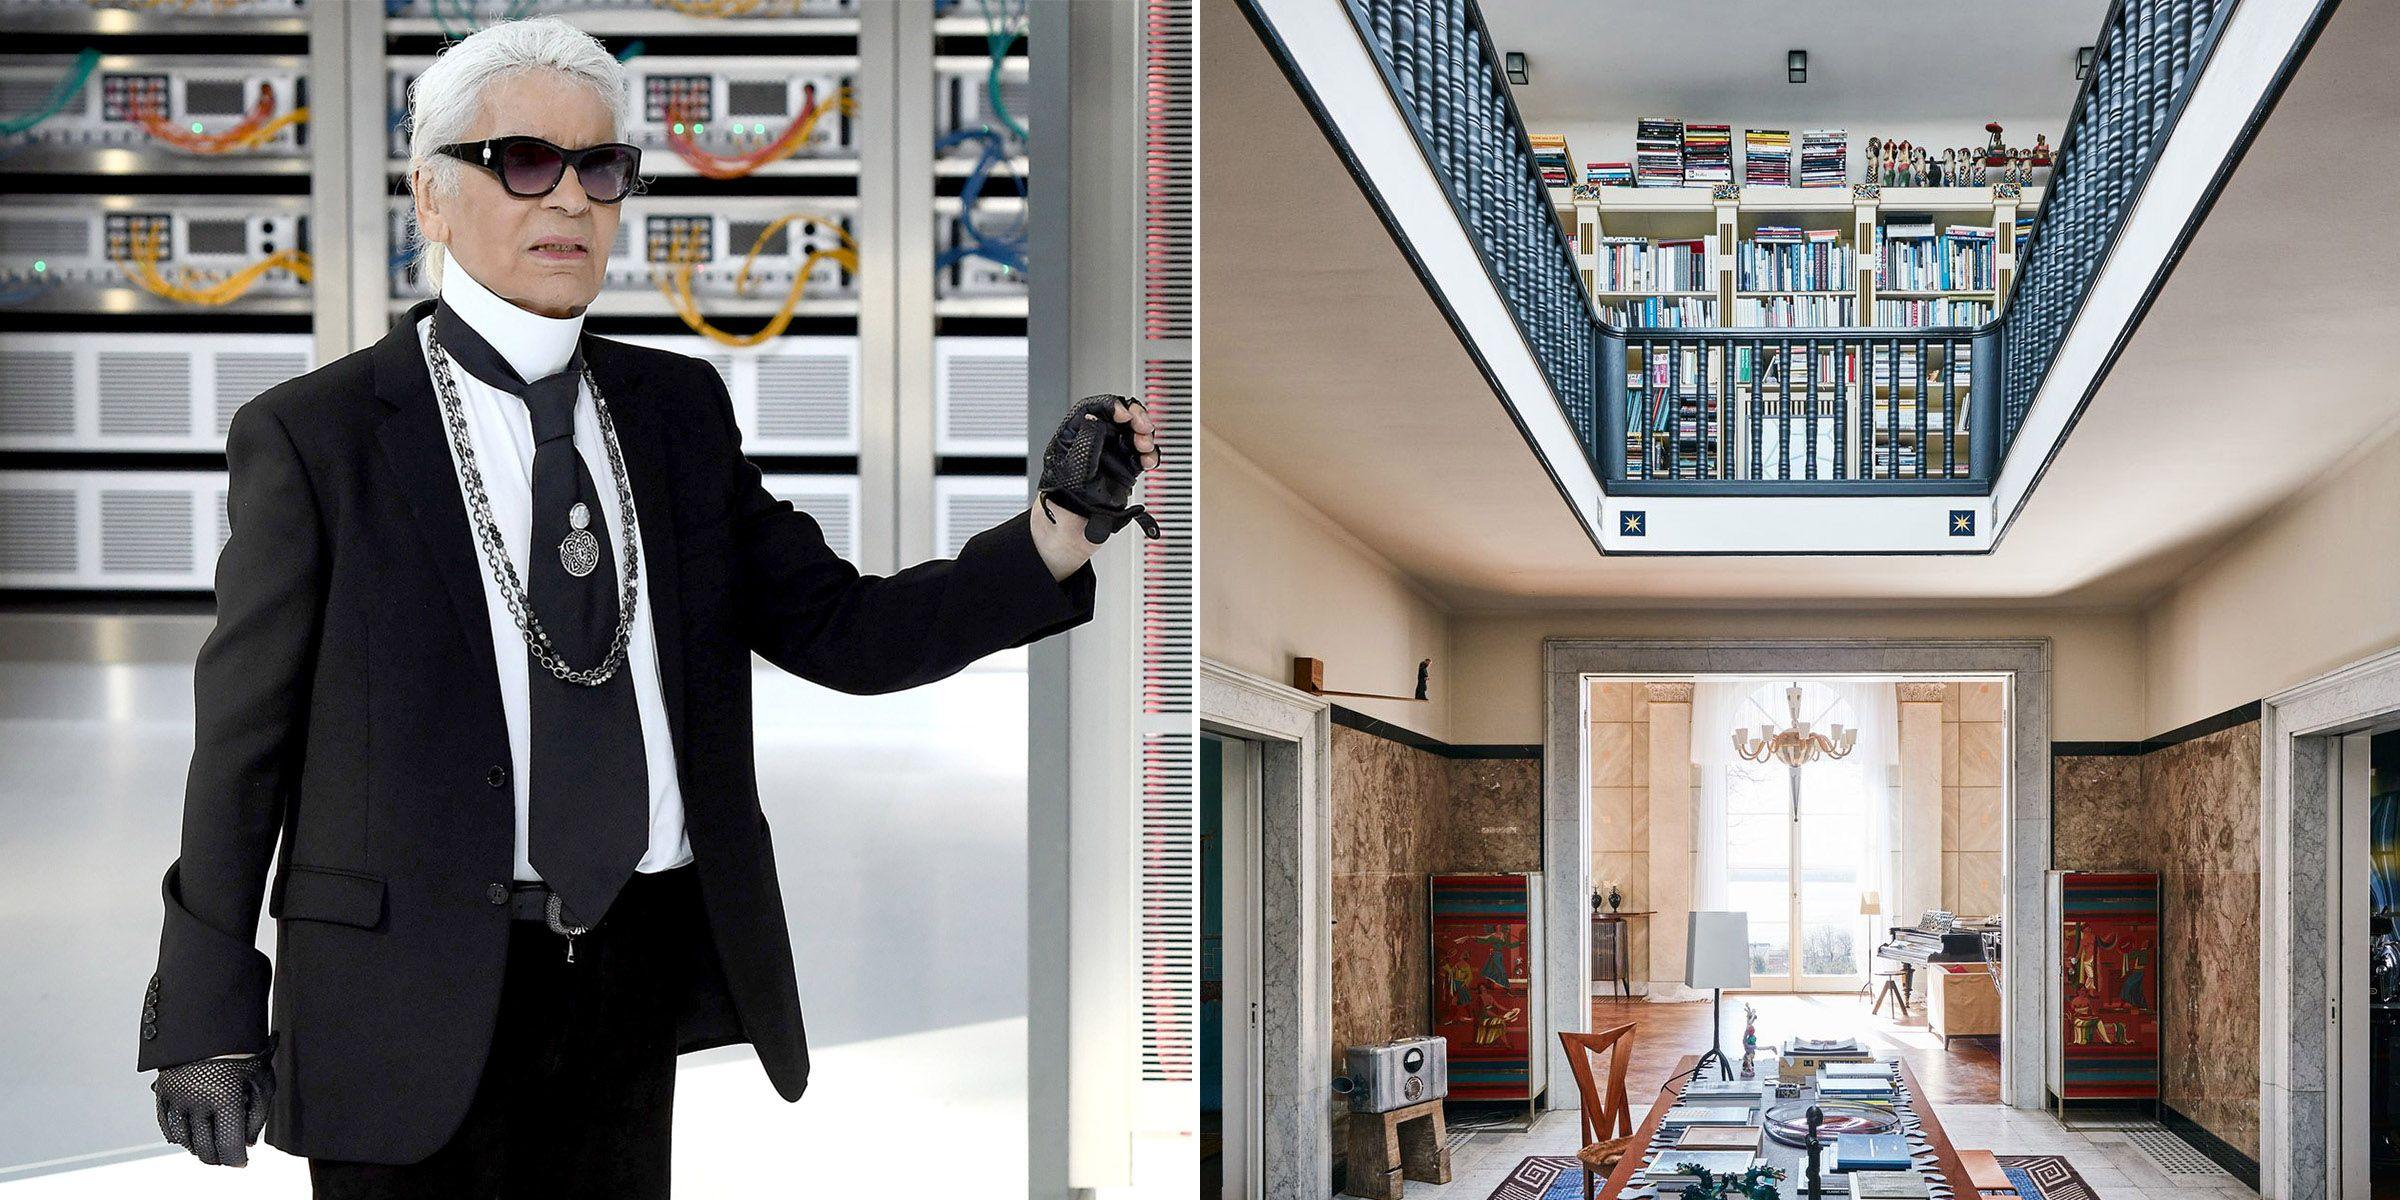 CHANEL, Jacques de Bascher, Karl Lagerfeld, Villa Jako, 卡爾別墅, 卡爾拉格斐, 老佛爺, 香奈兒